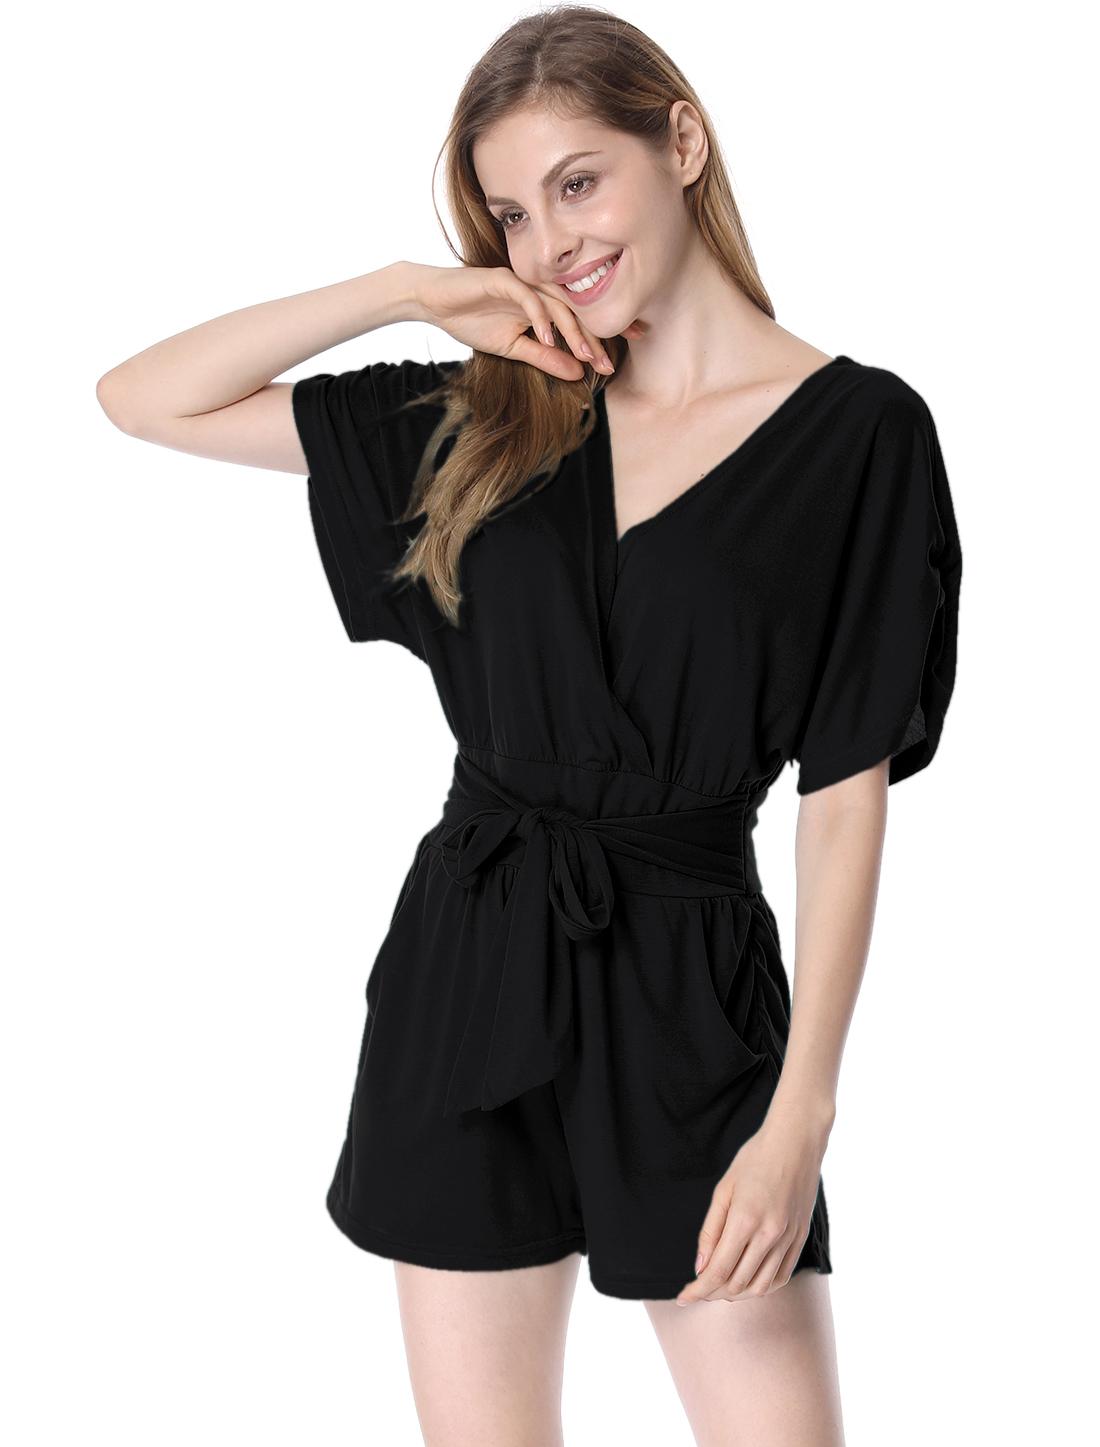 Stylish Crossover V-Neck Short Dolman Sleeve Pure Black Romper for Lady XL